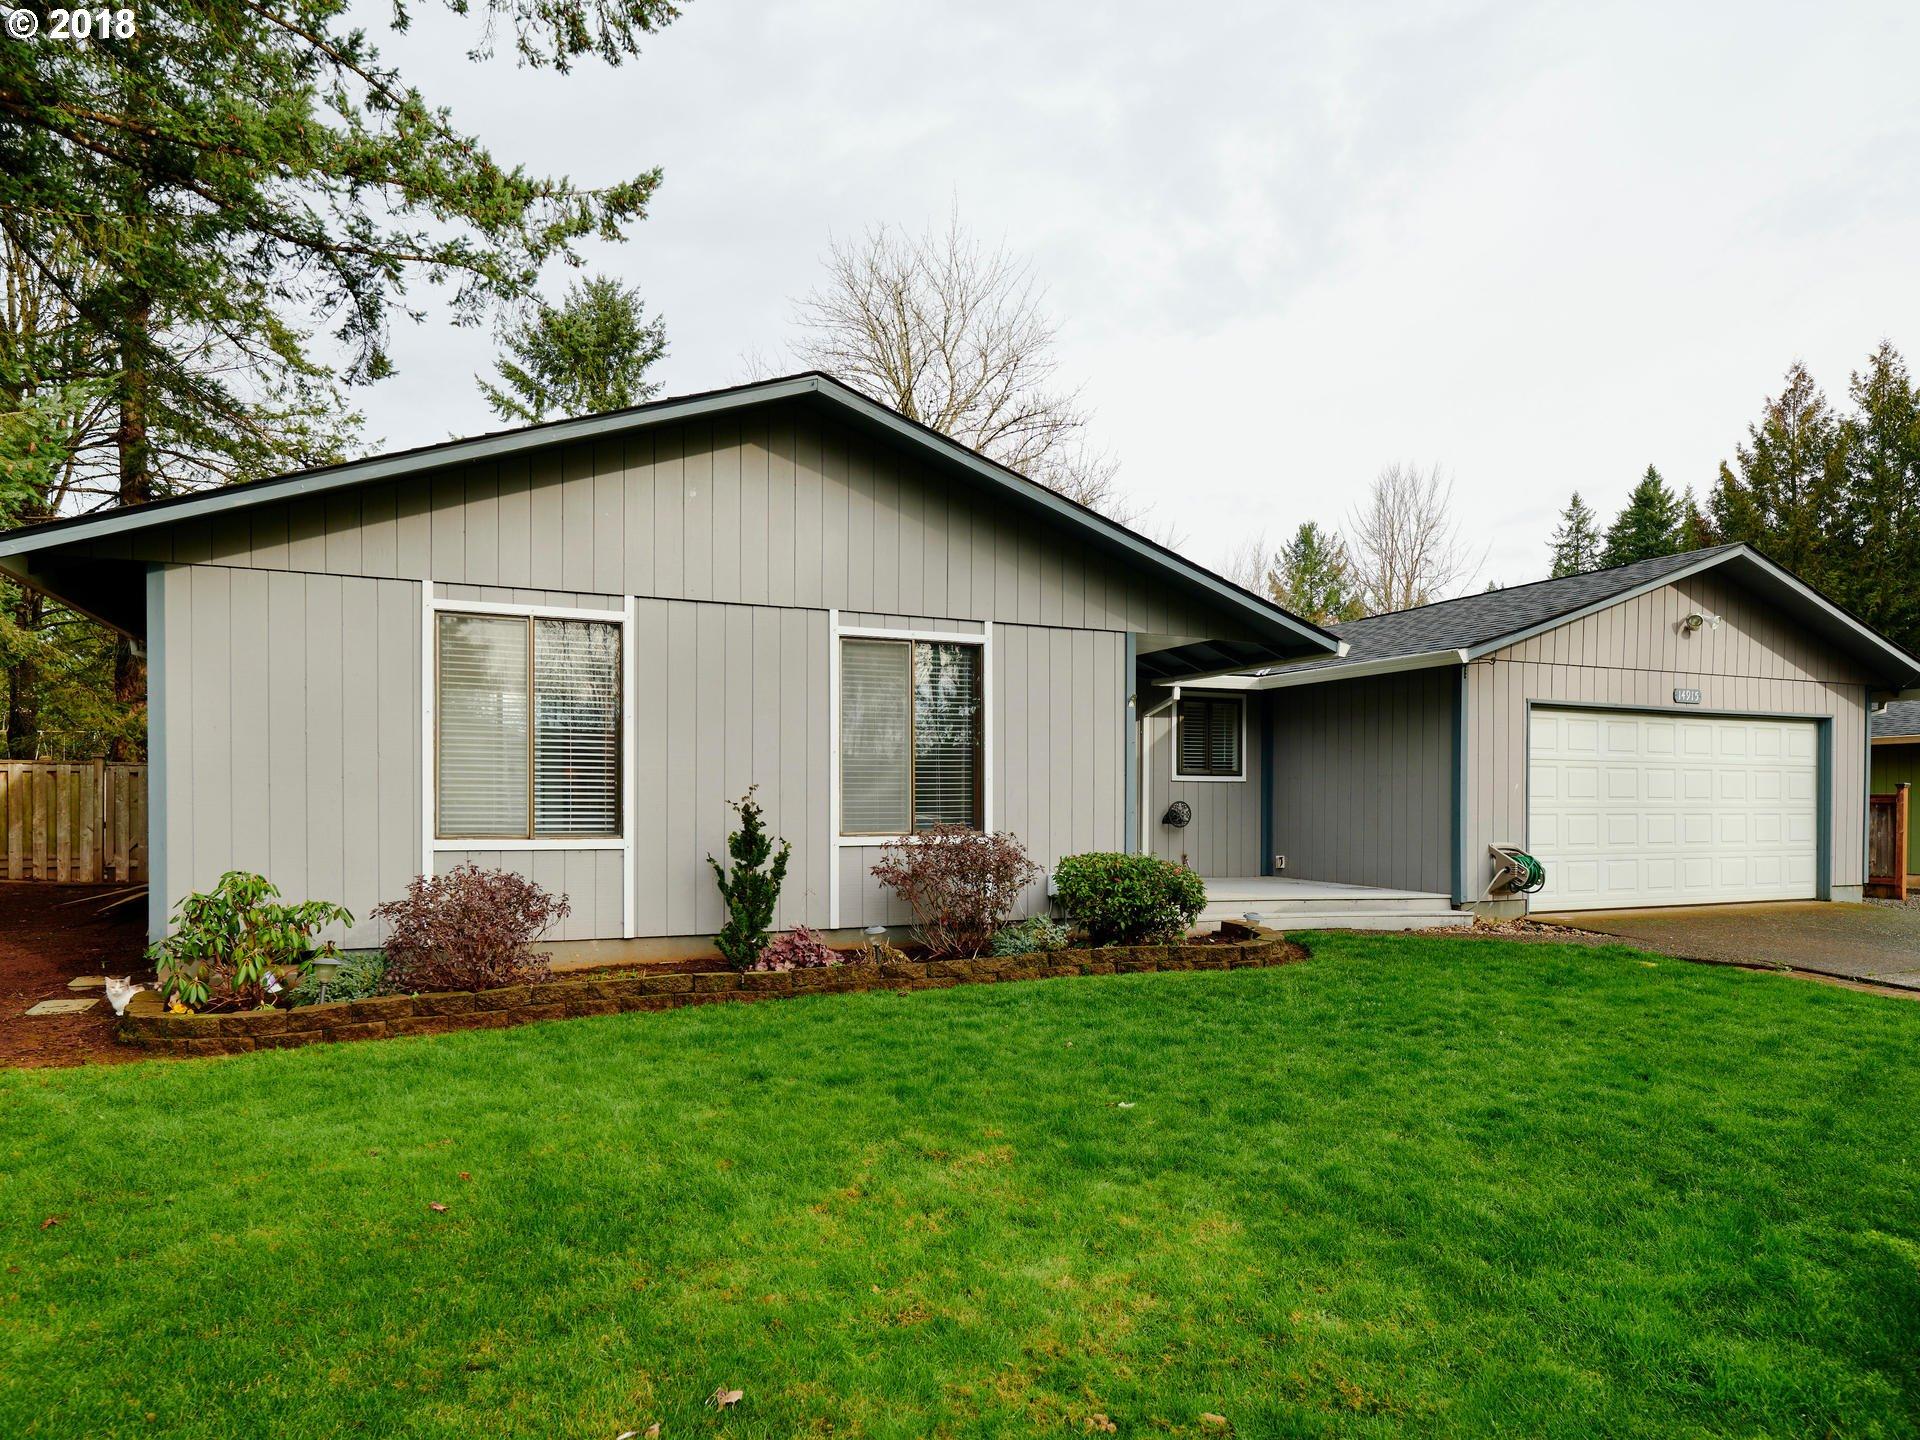 14915 S GREENTREE DR OREGON CITY OR 97045 Oregon City Realtor